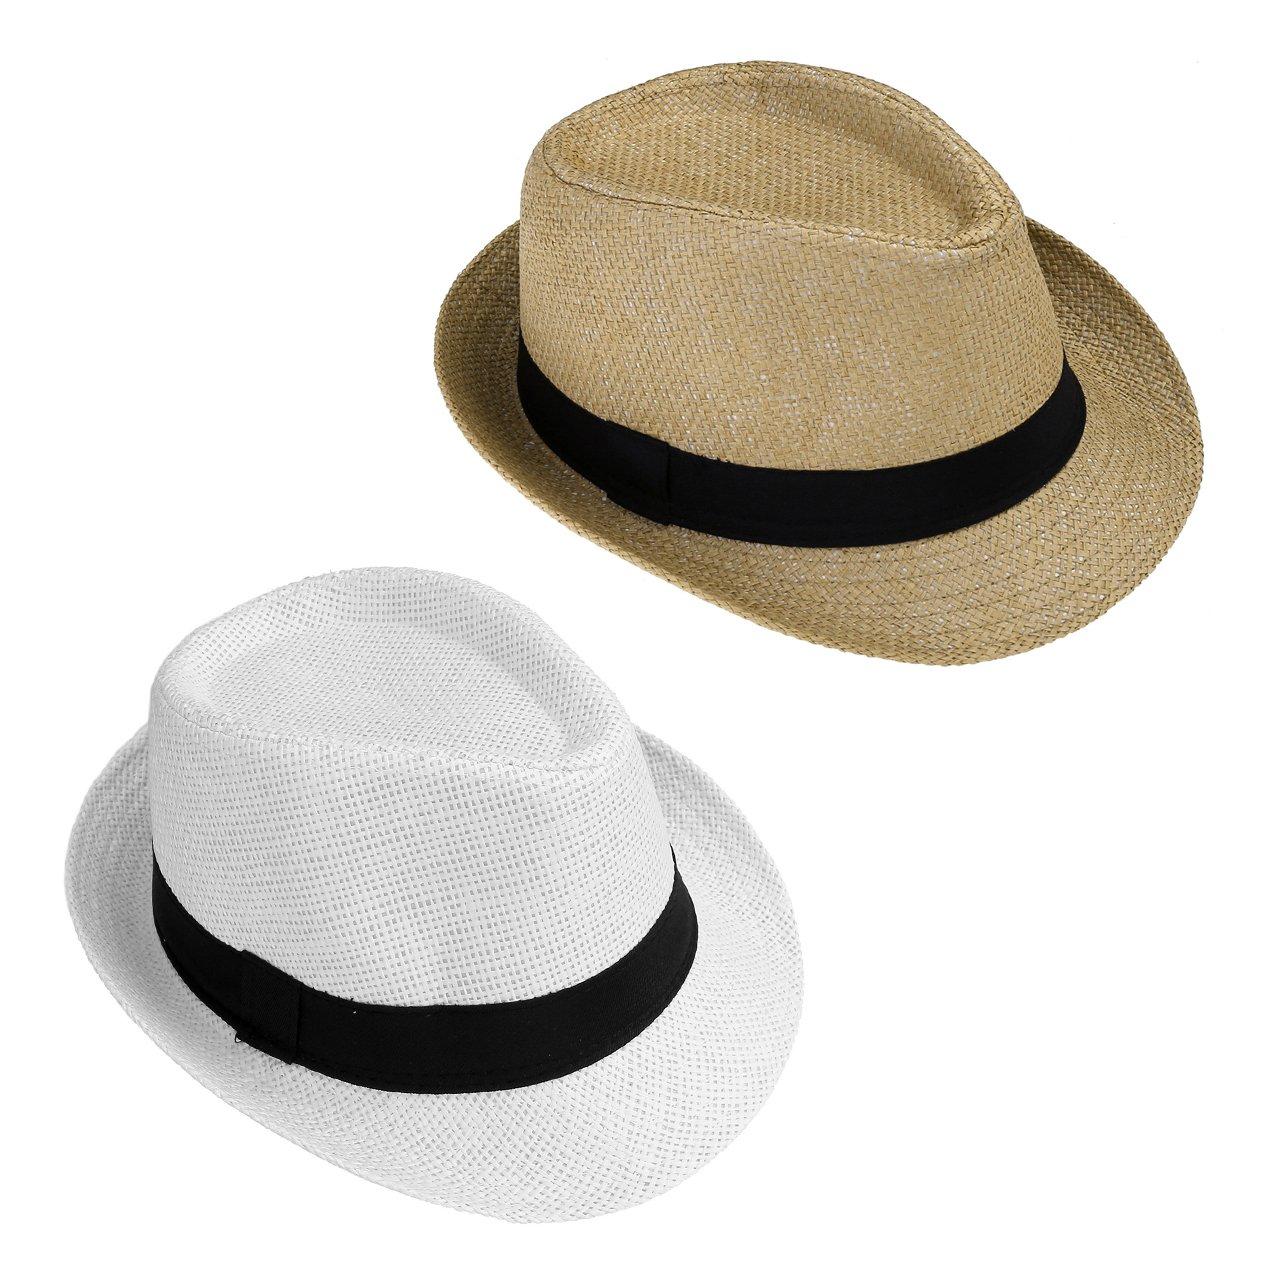 Faleto Herren Damen Panamahut Sonnenhut Sommerhut Beach Hut Strohhut Jazz Hut